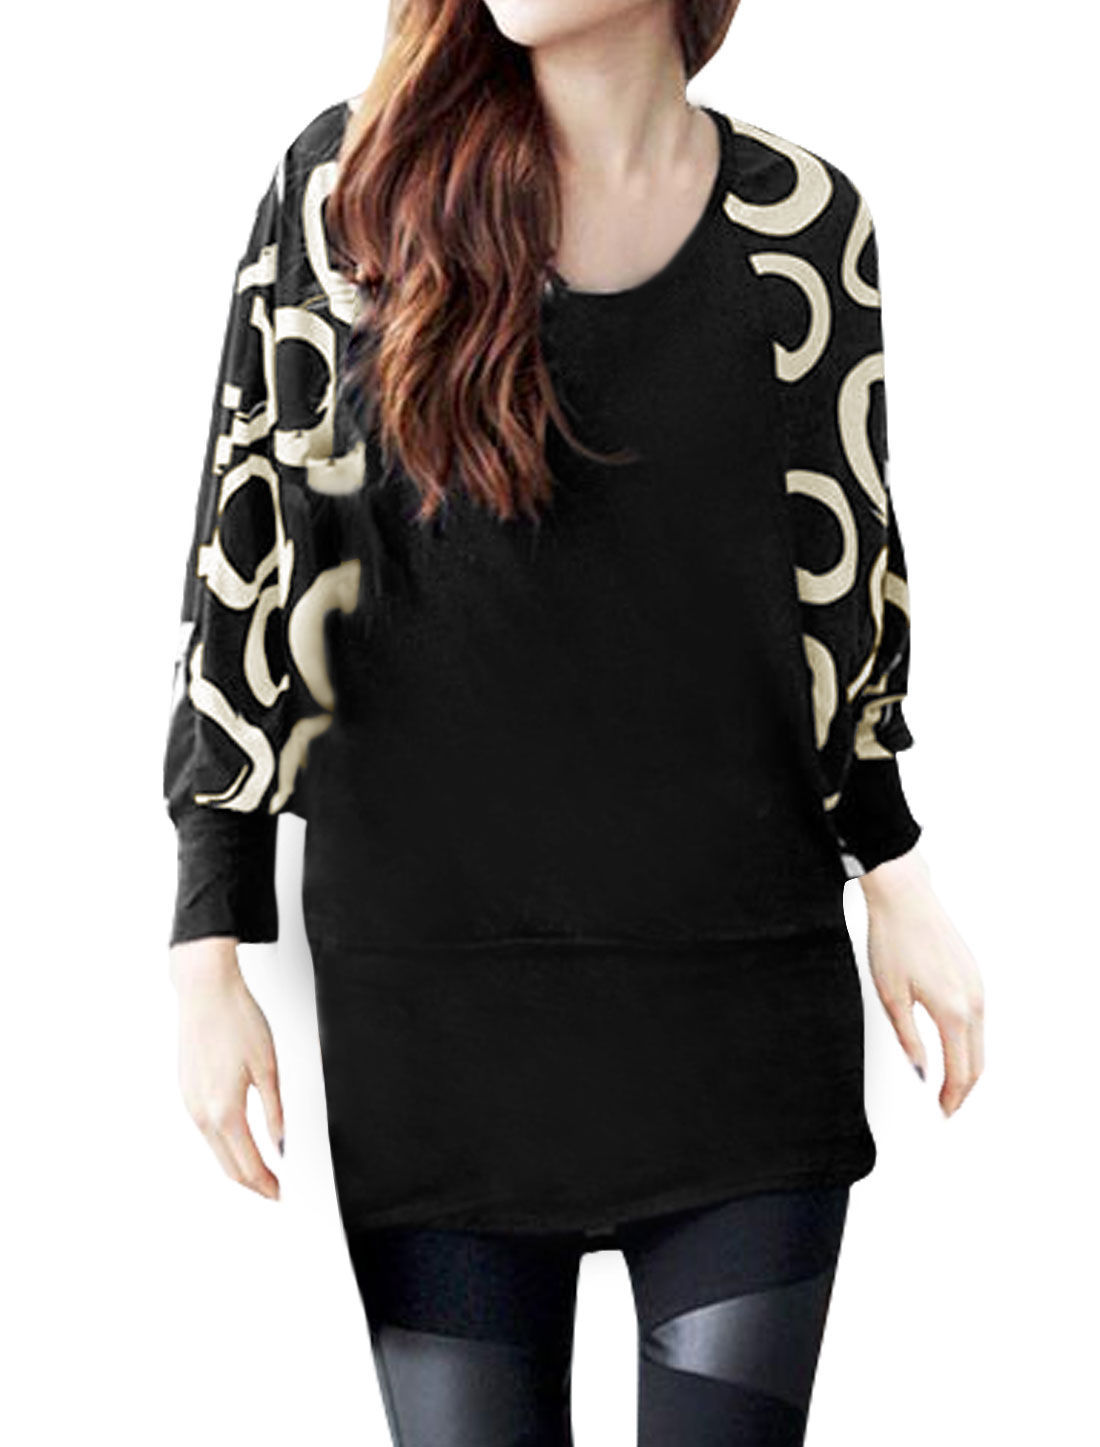 Women Batwing Sleeves Circles Print Loose Tunic Blouse Black XS